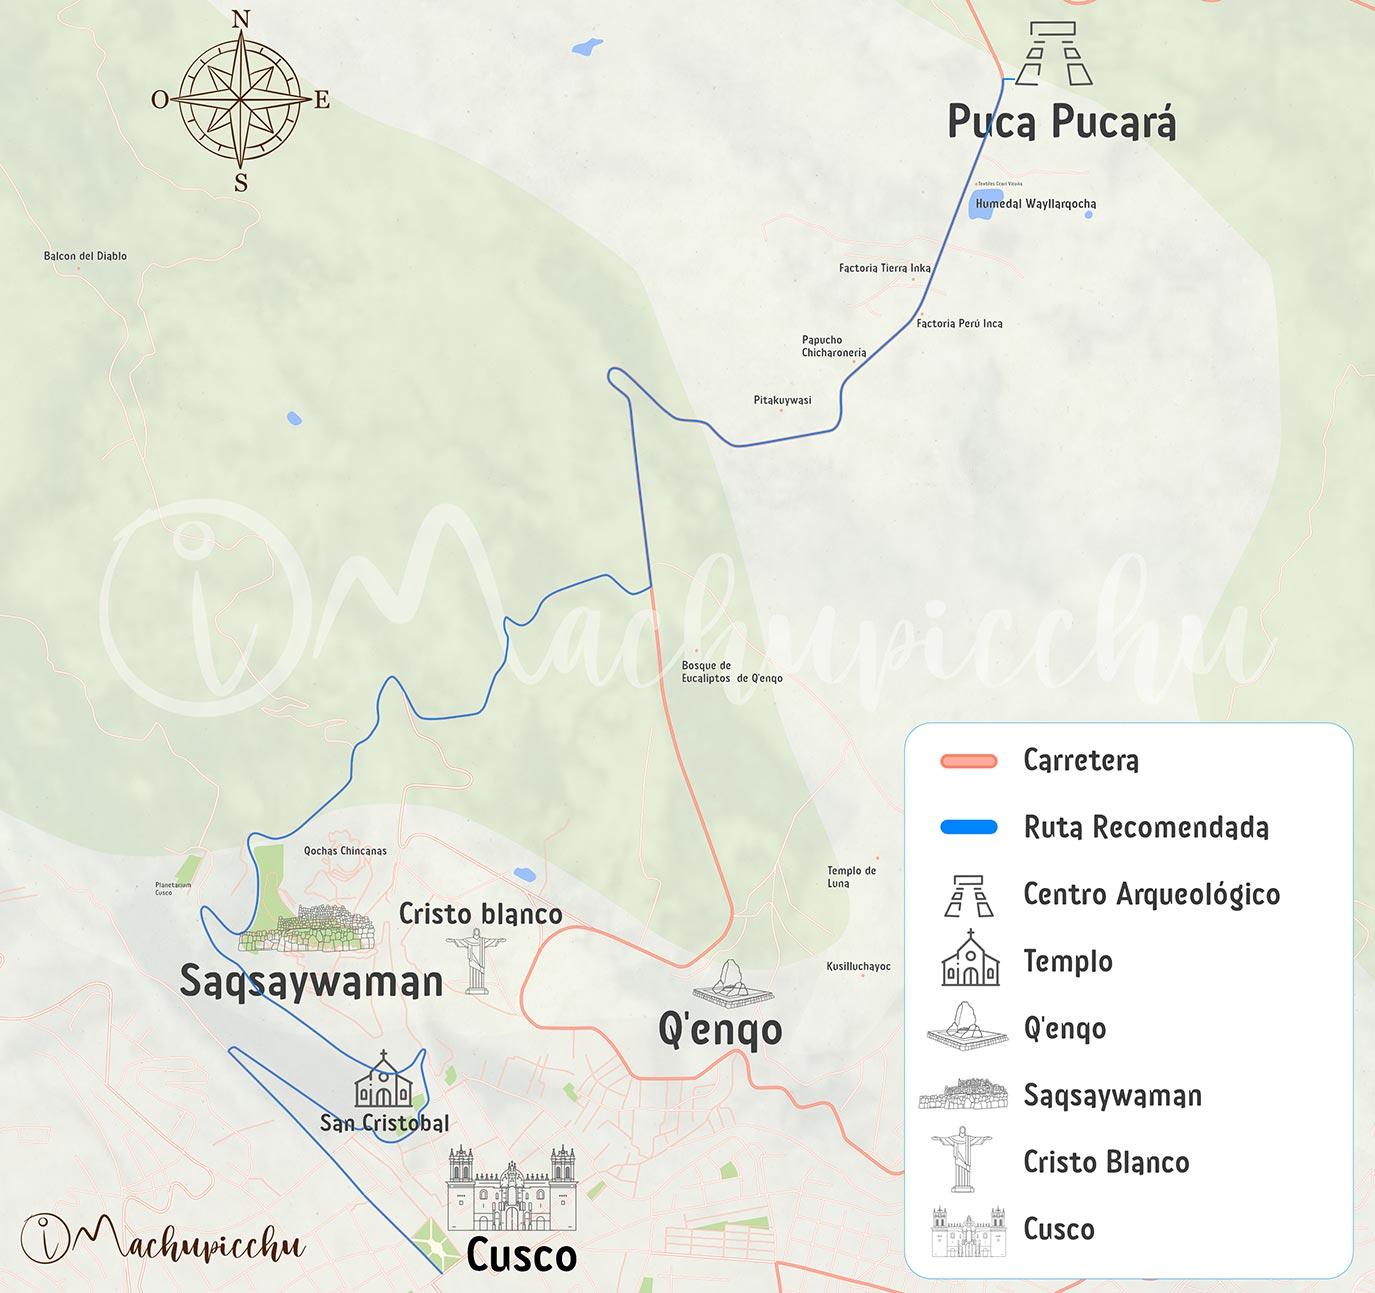 Mapa para llegar a Puca pucara